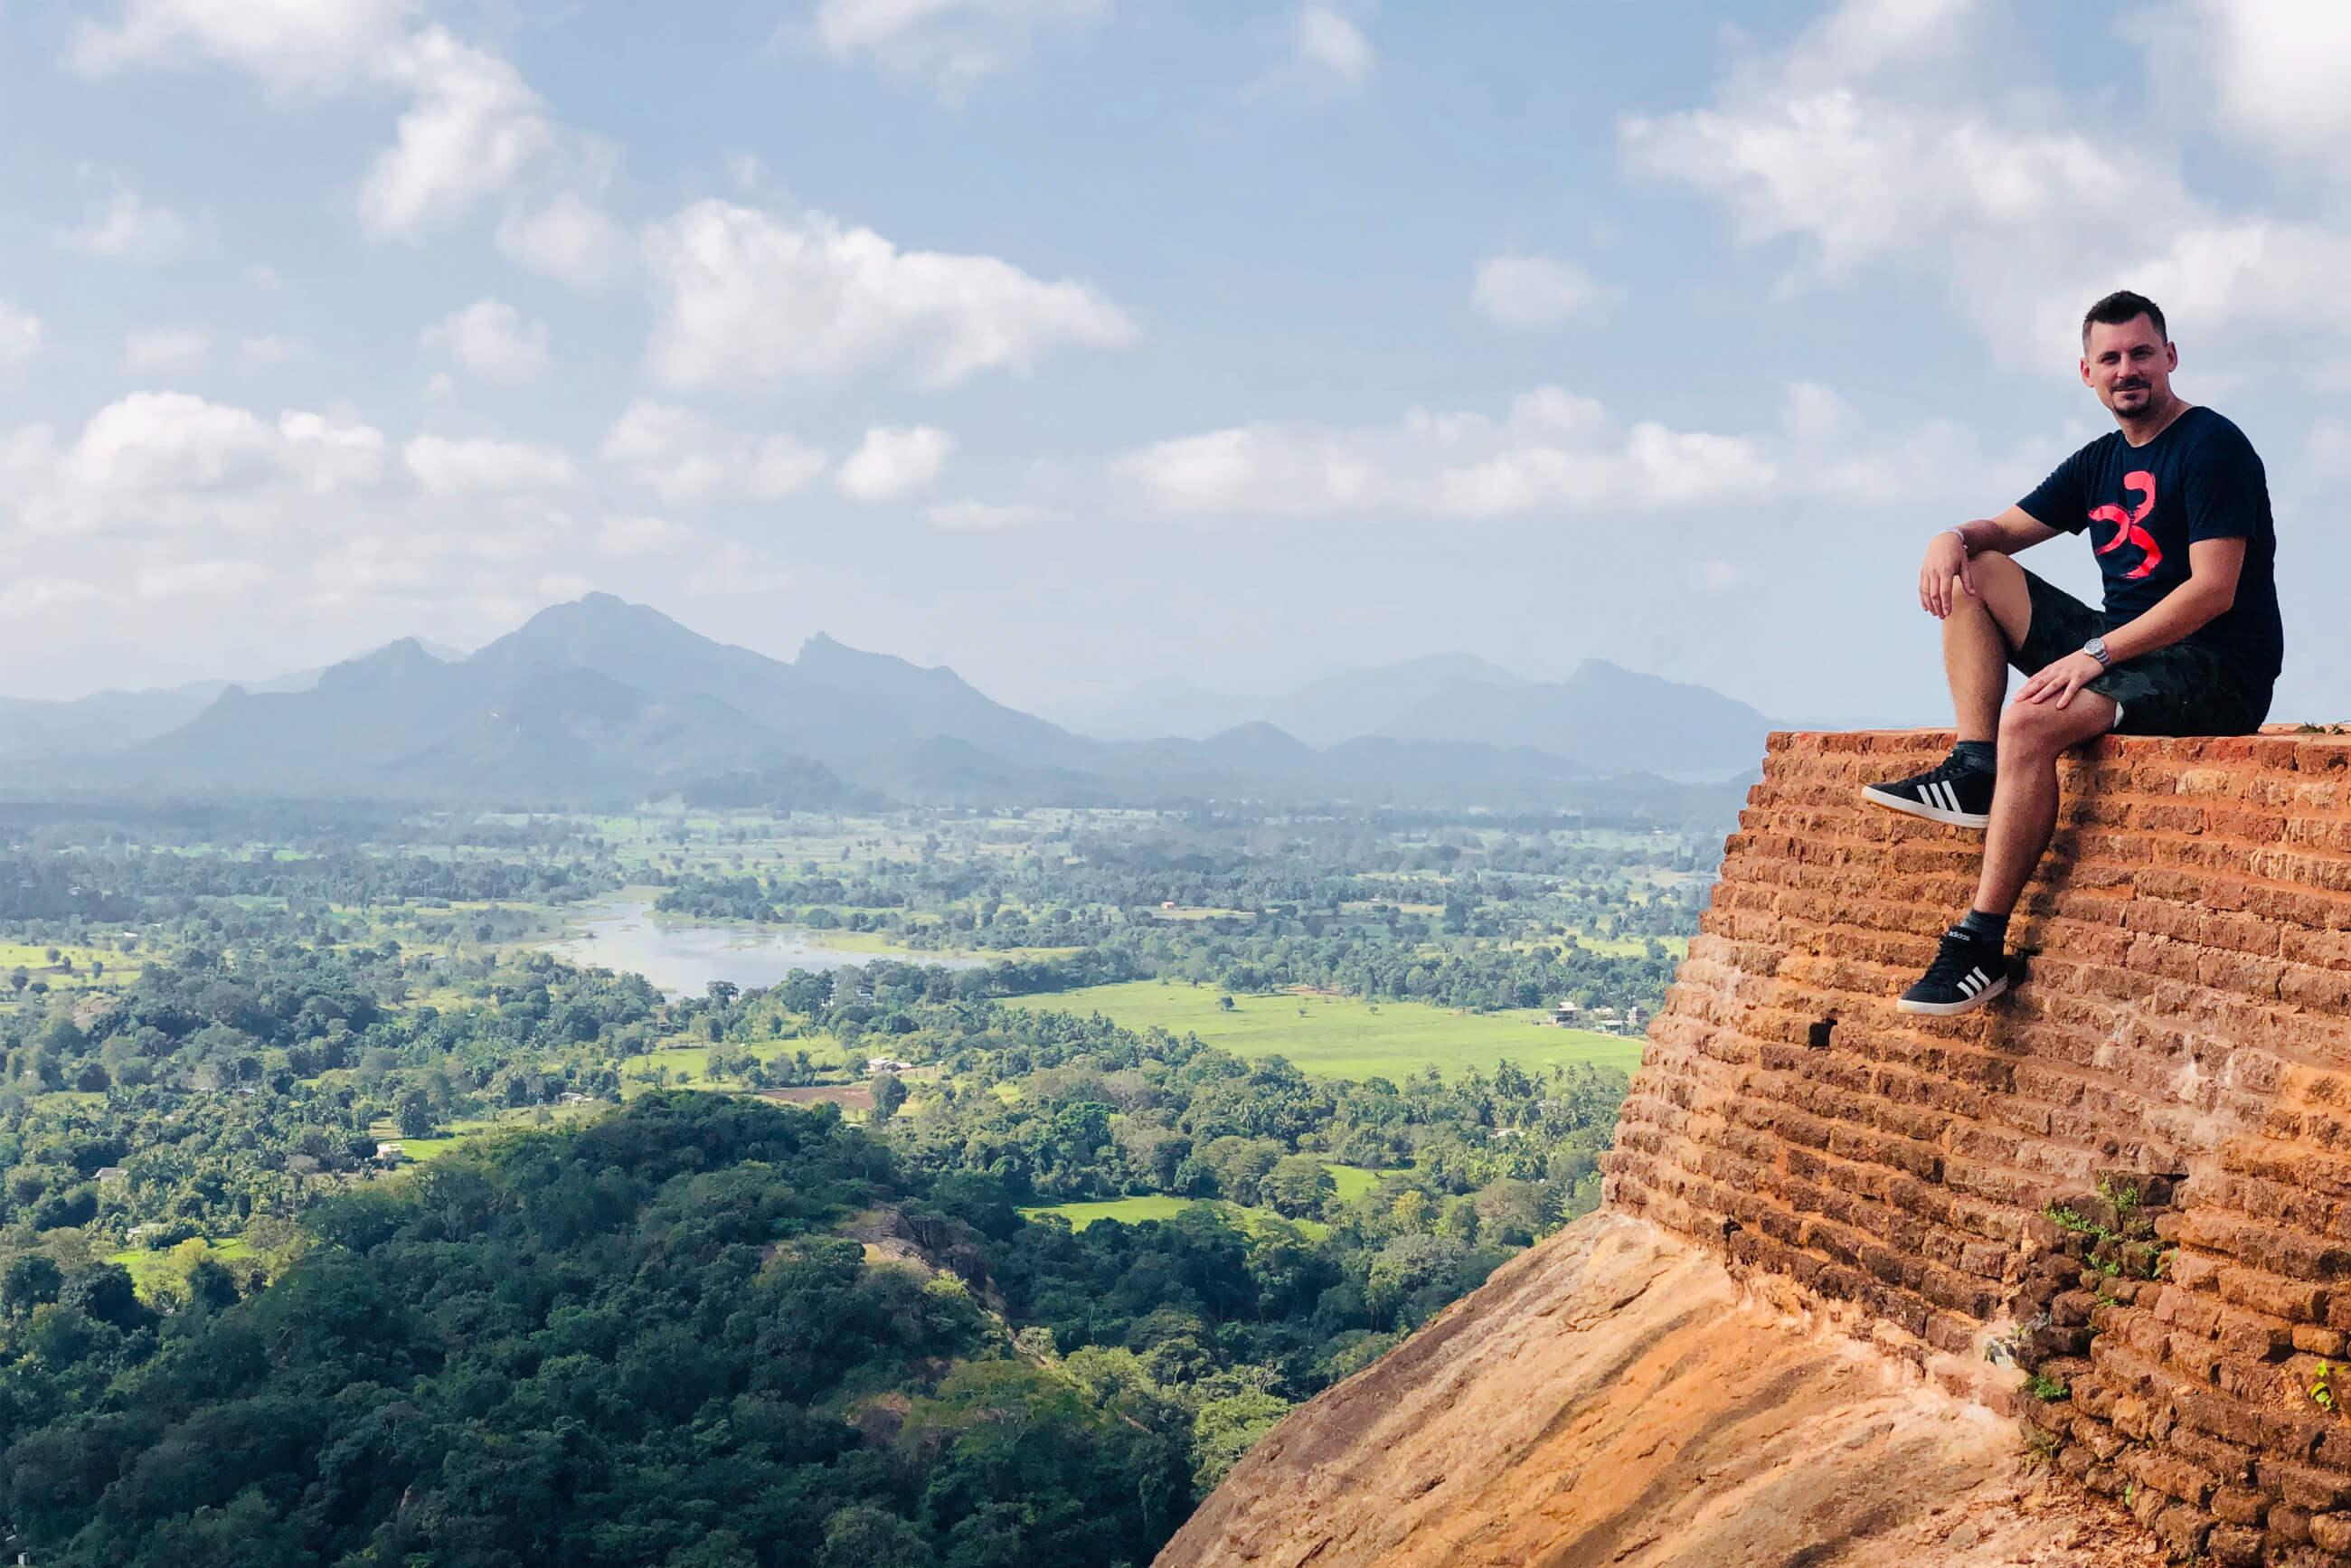 https://bubo.sk/uploads/galleries/7327/martinferencik_srilanka_photo-27-01-2019-13-15-23-1.jpg